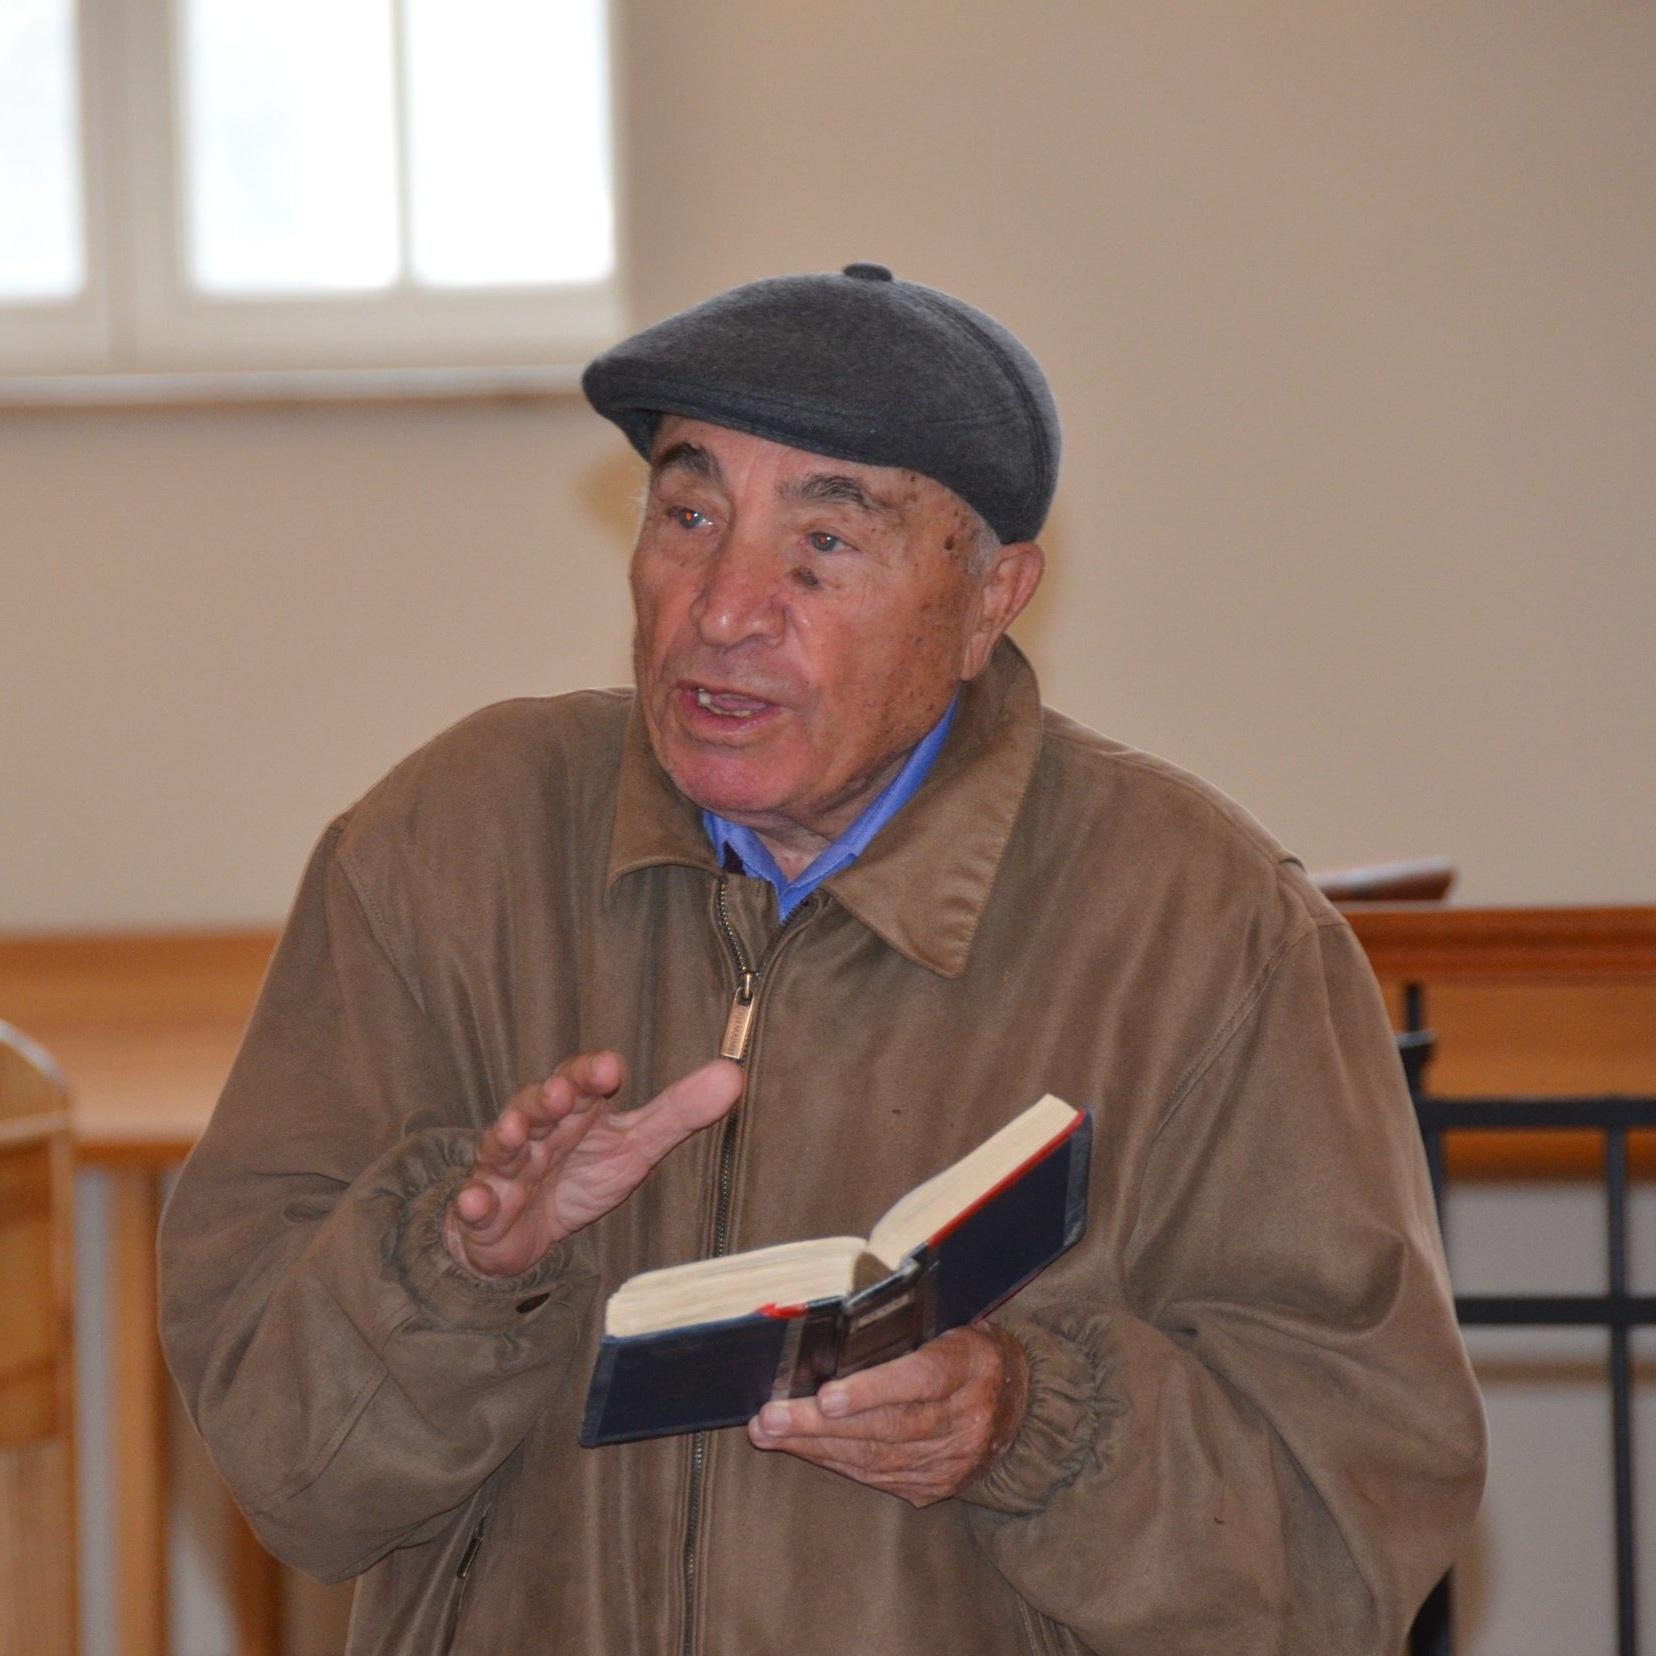 Irving Eisner